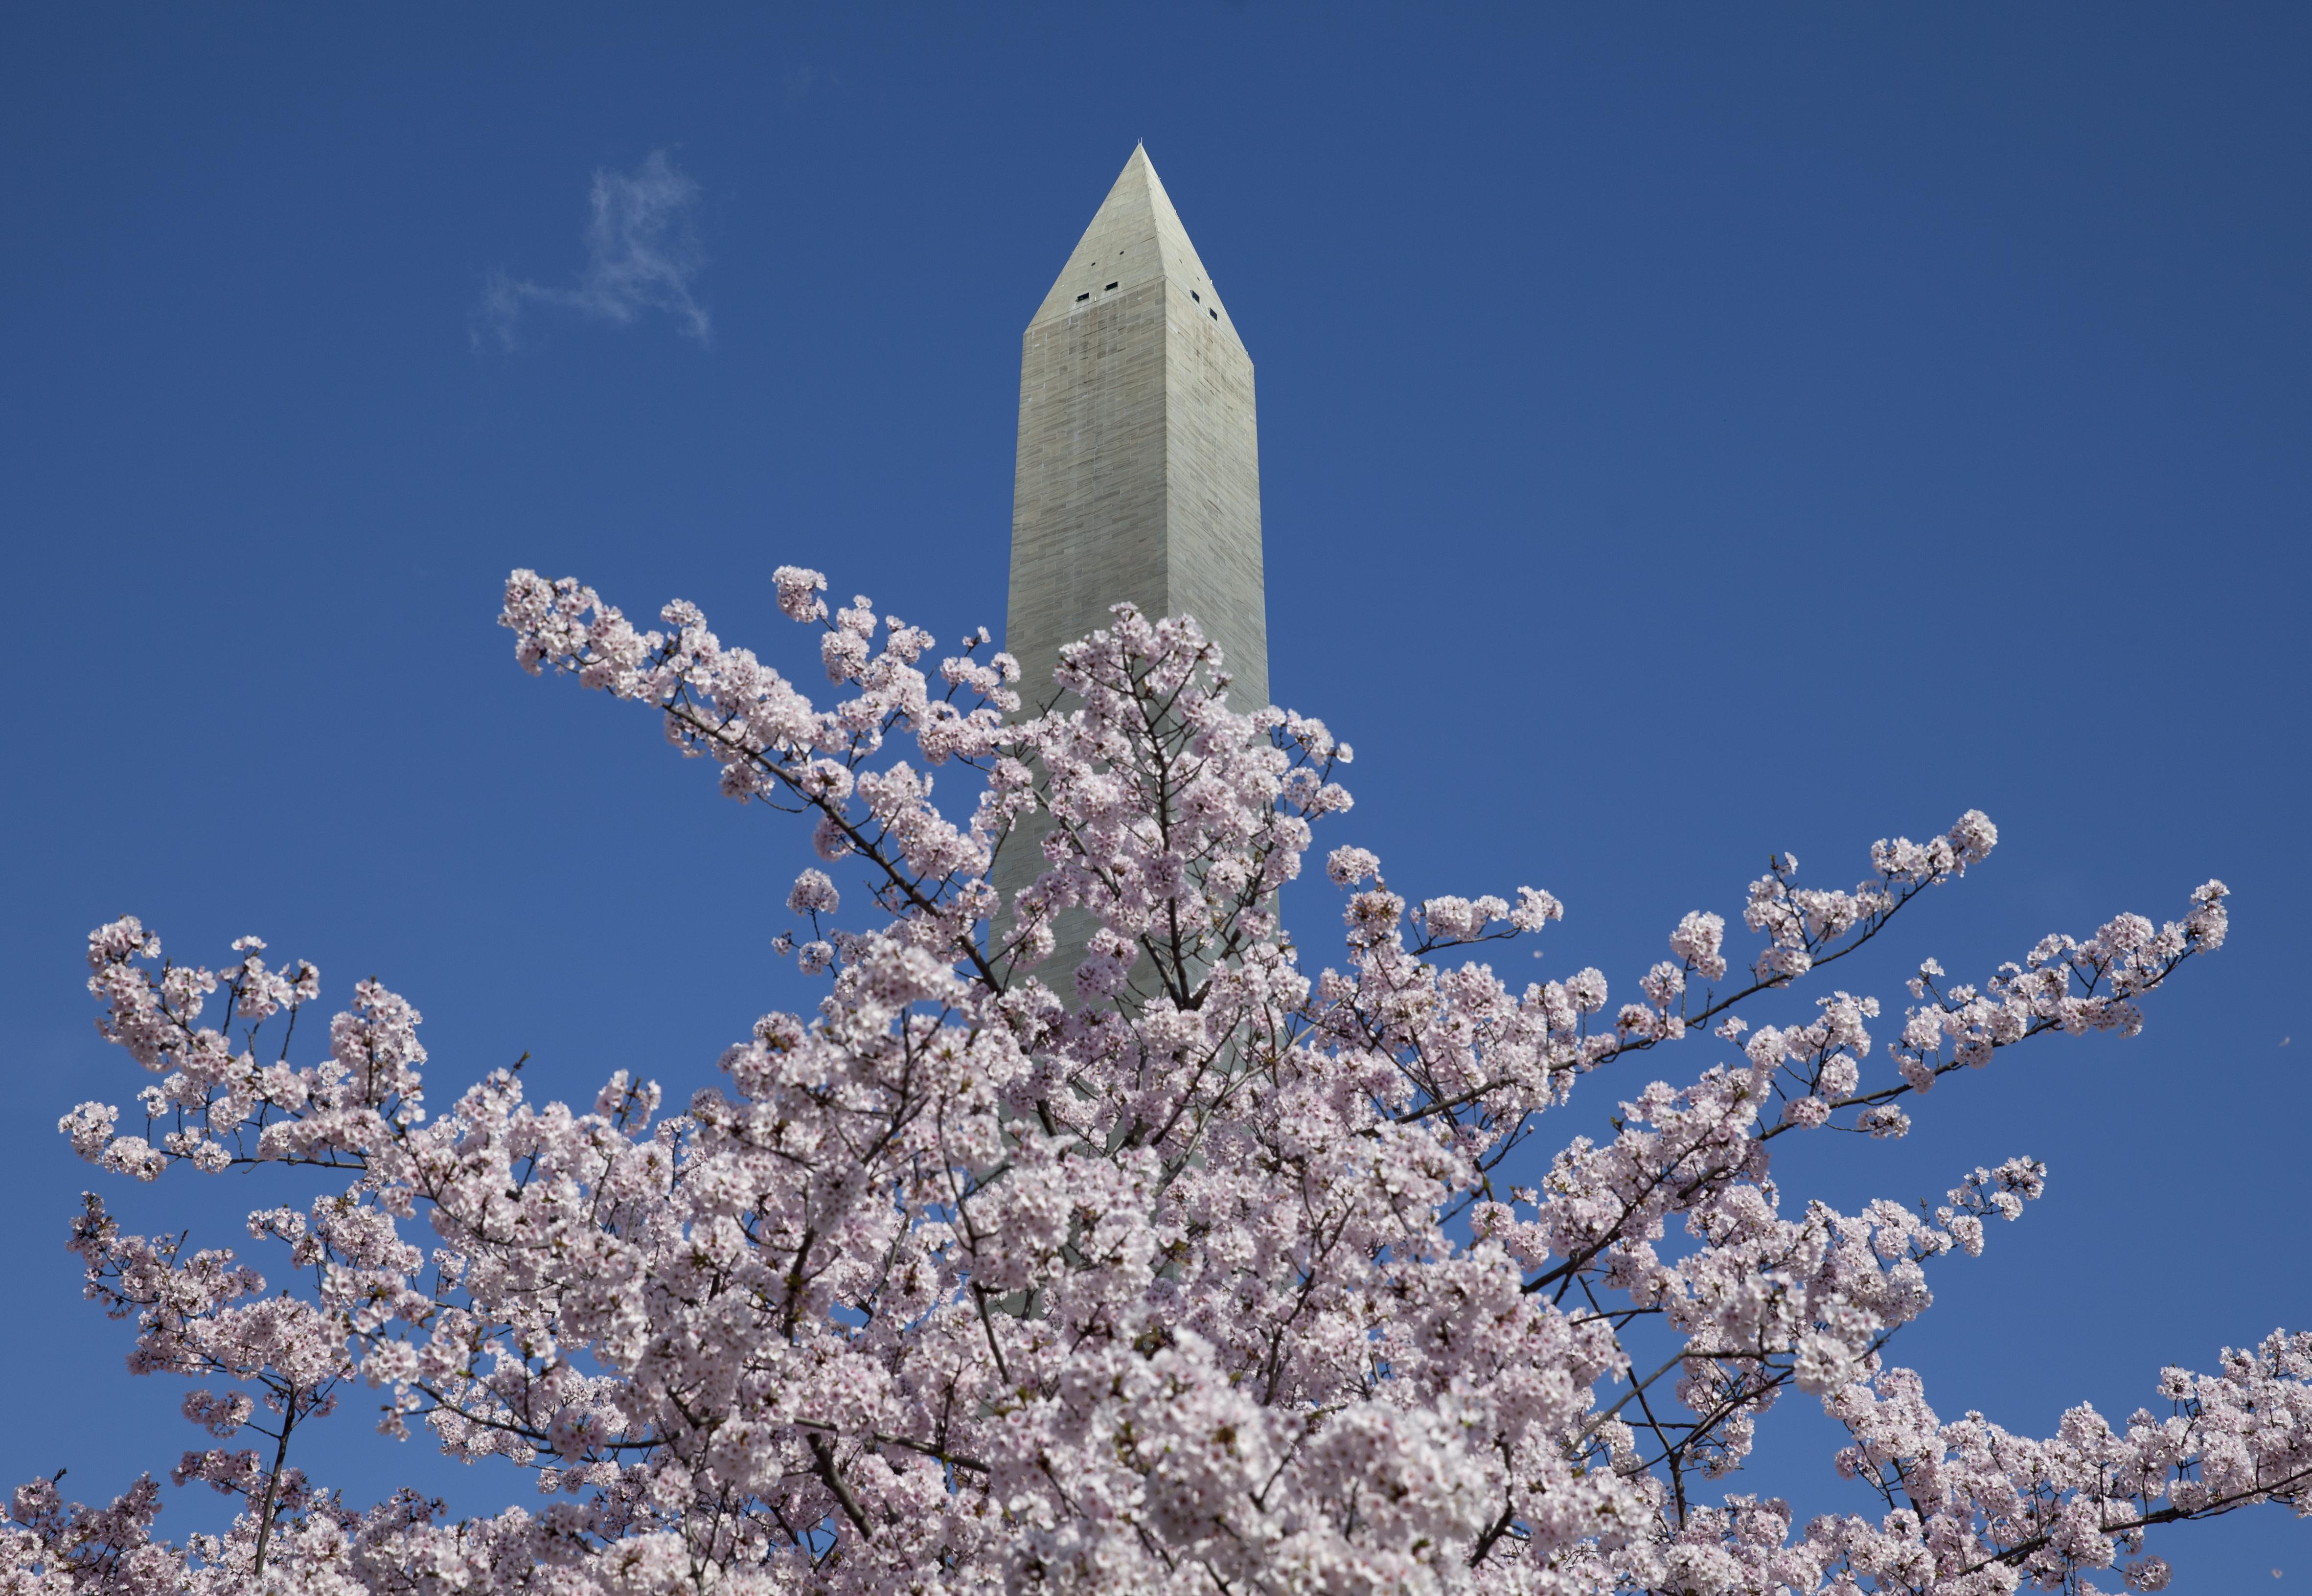 Plan ahead for Cherry Blossom Festival parking